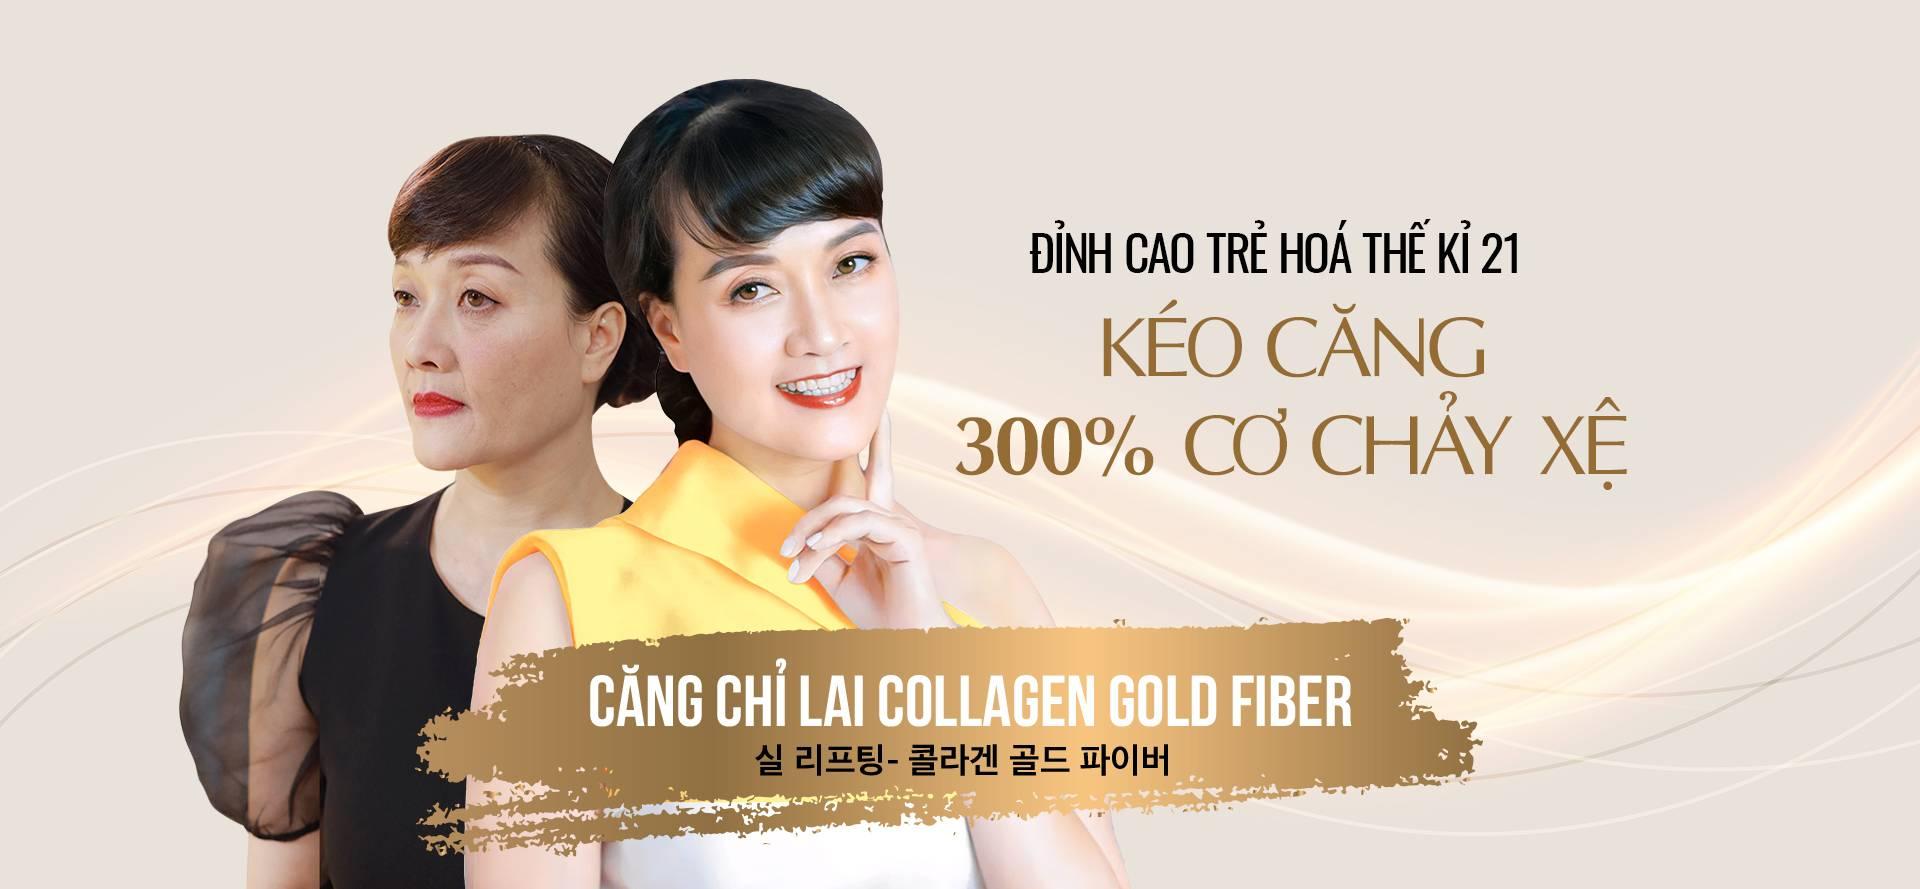 pc-dinh-cao-tre-hoa-collagen